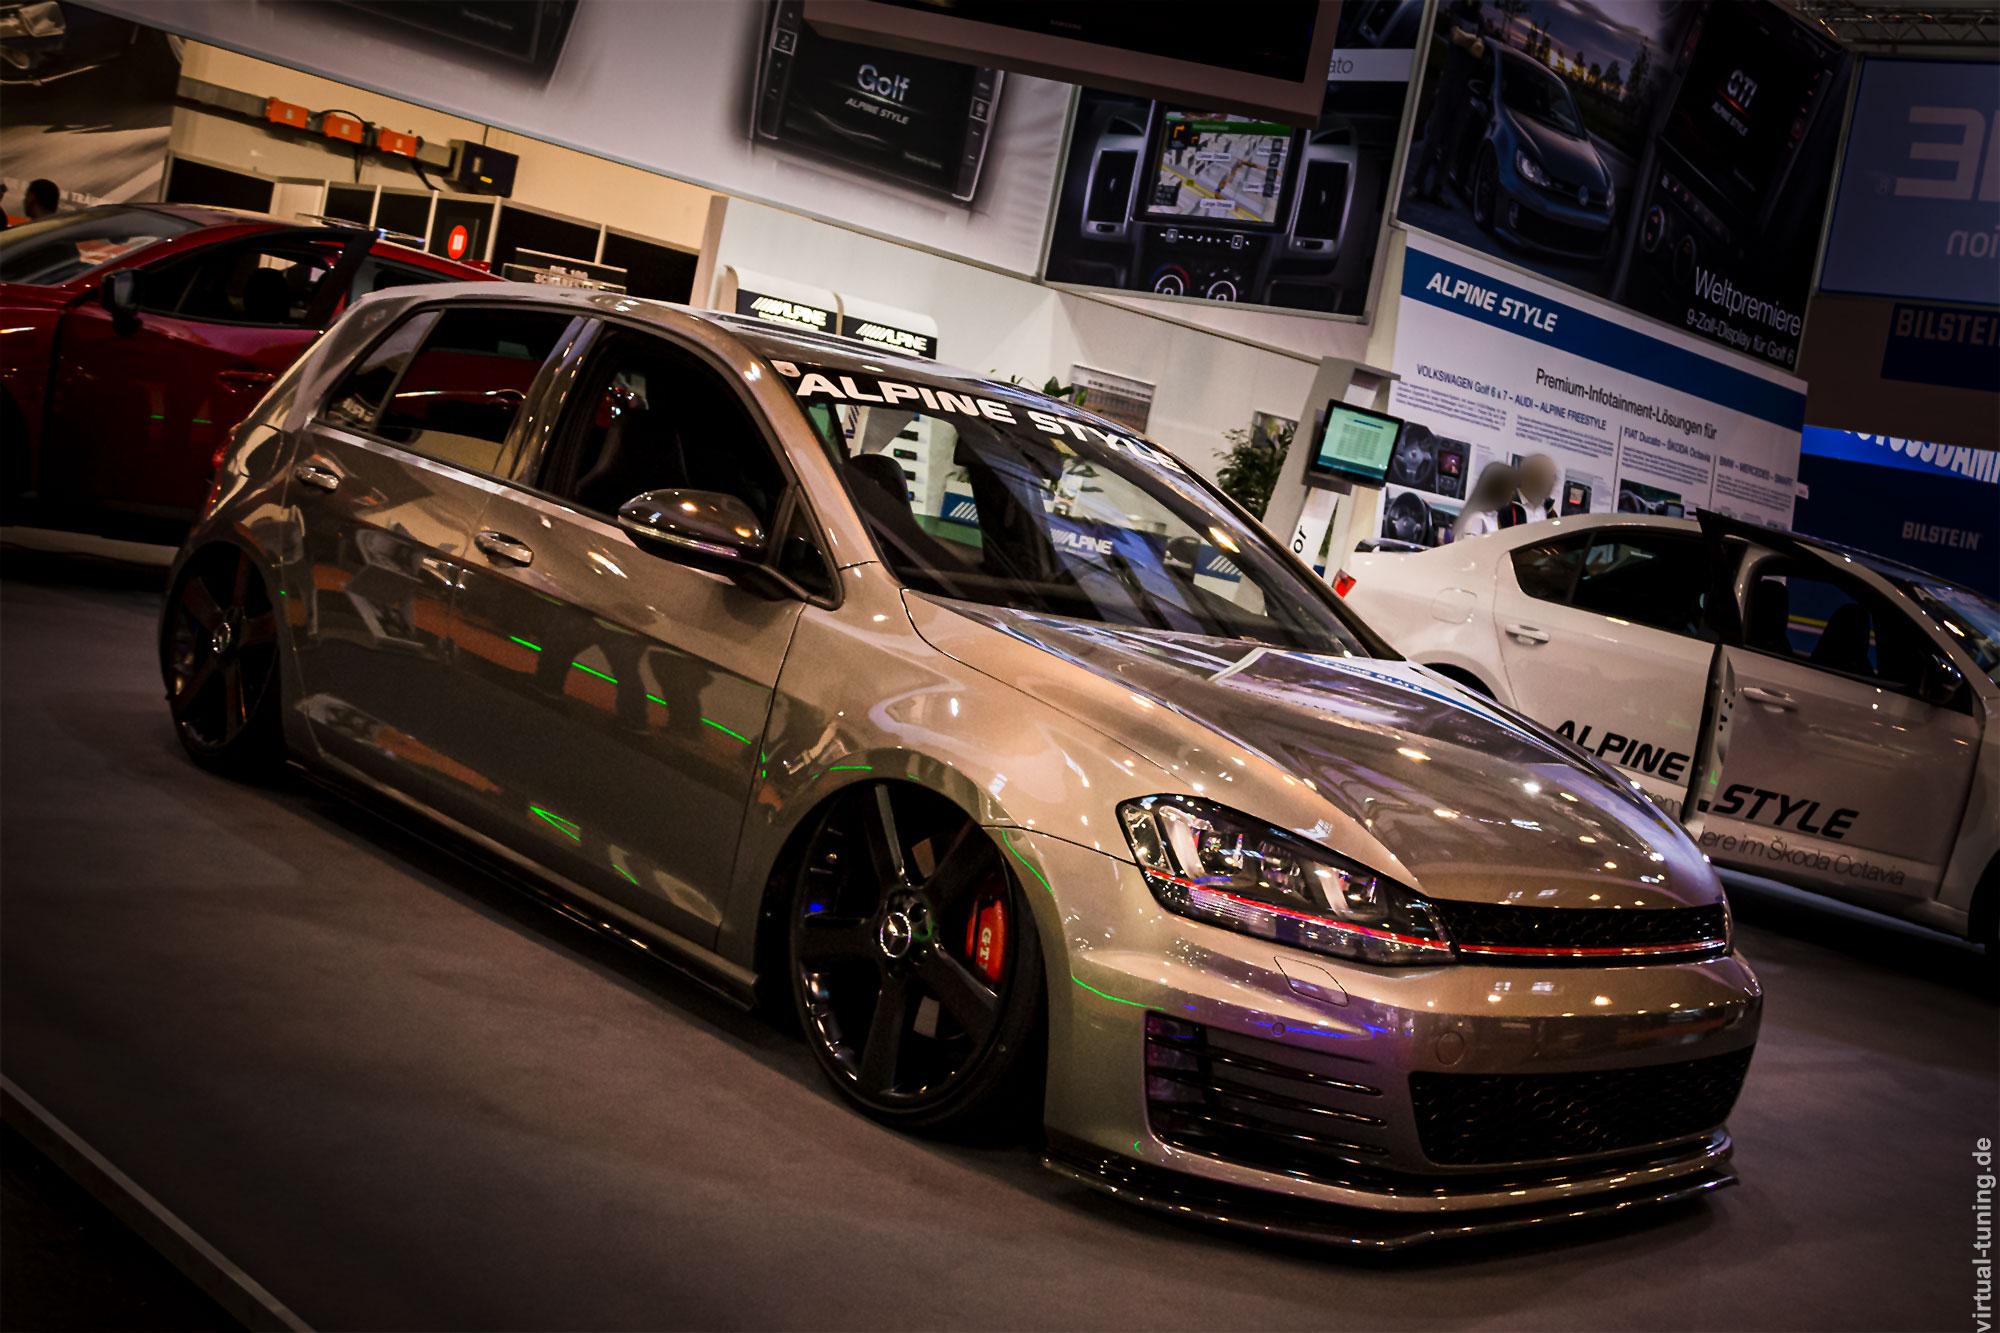 Volkswagen Golf 7 GTI (Alpine) - Essen Motor Show 2016